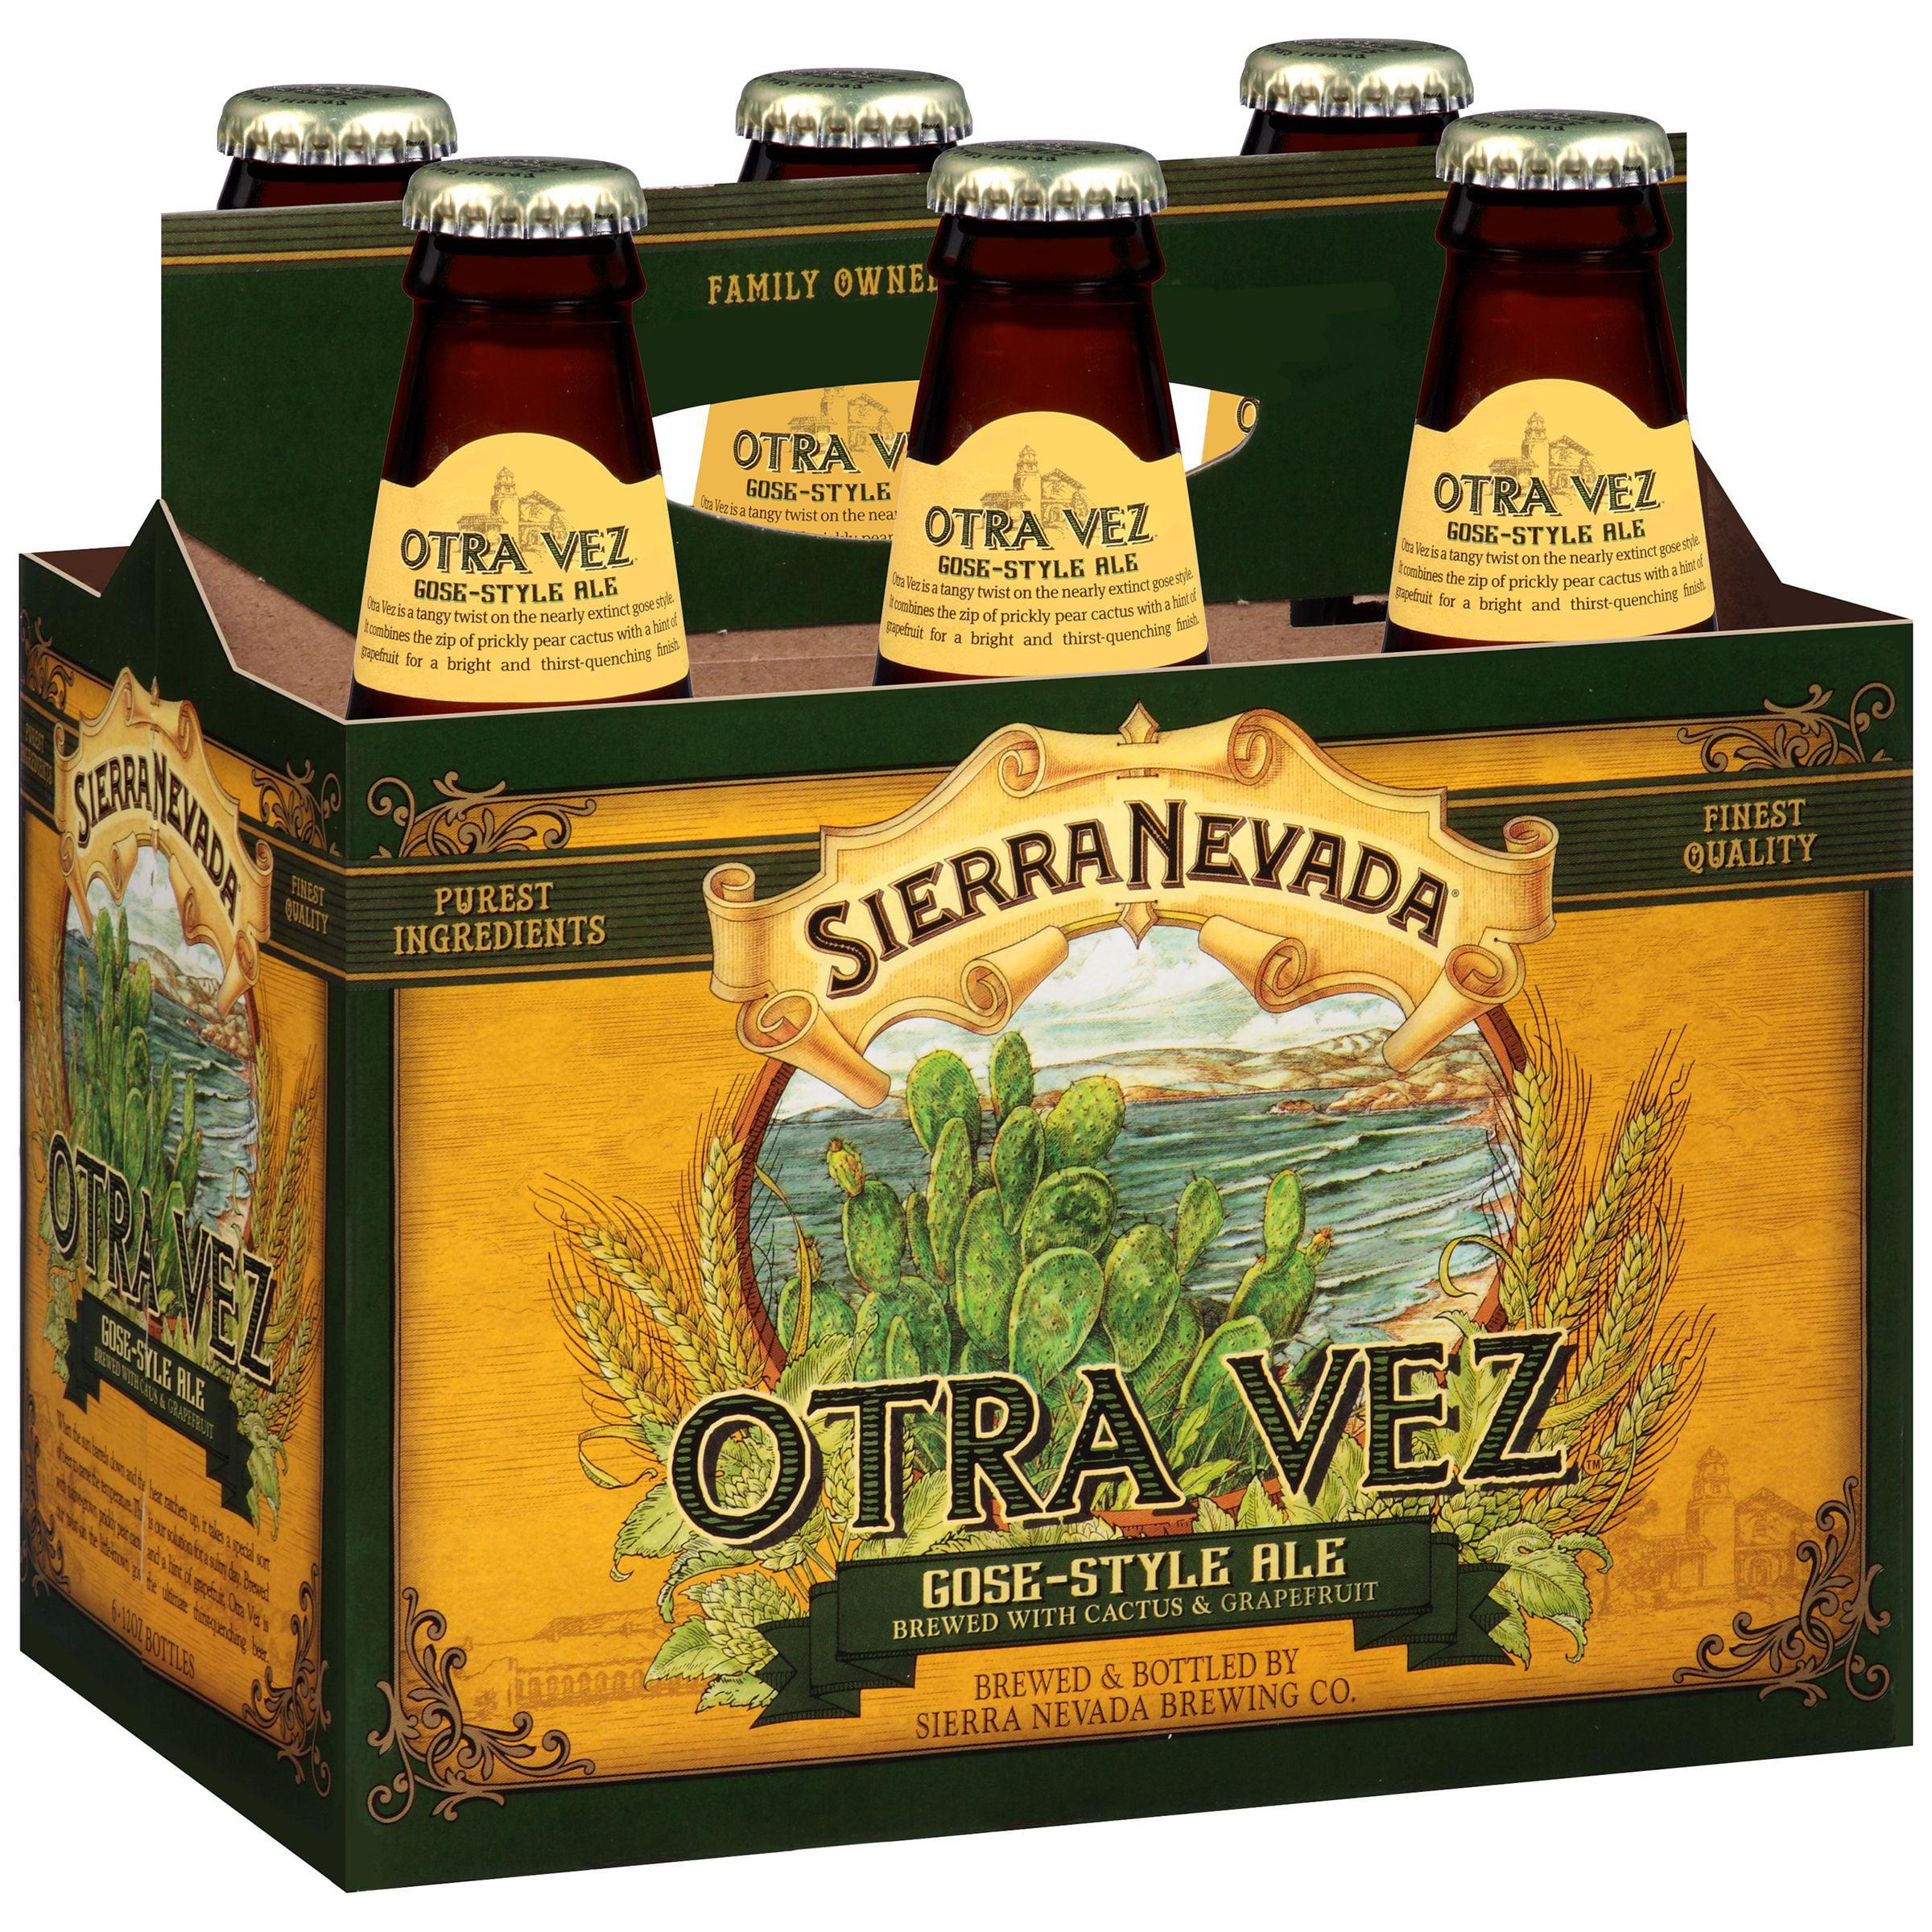 Sierra Nevada Otra Vez Gose-Style Ale, 6 pack, 12 fl oz